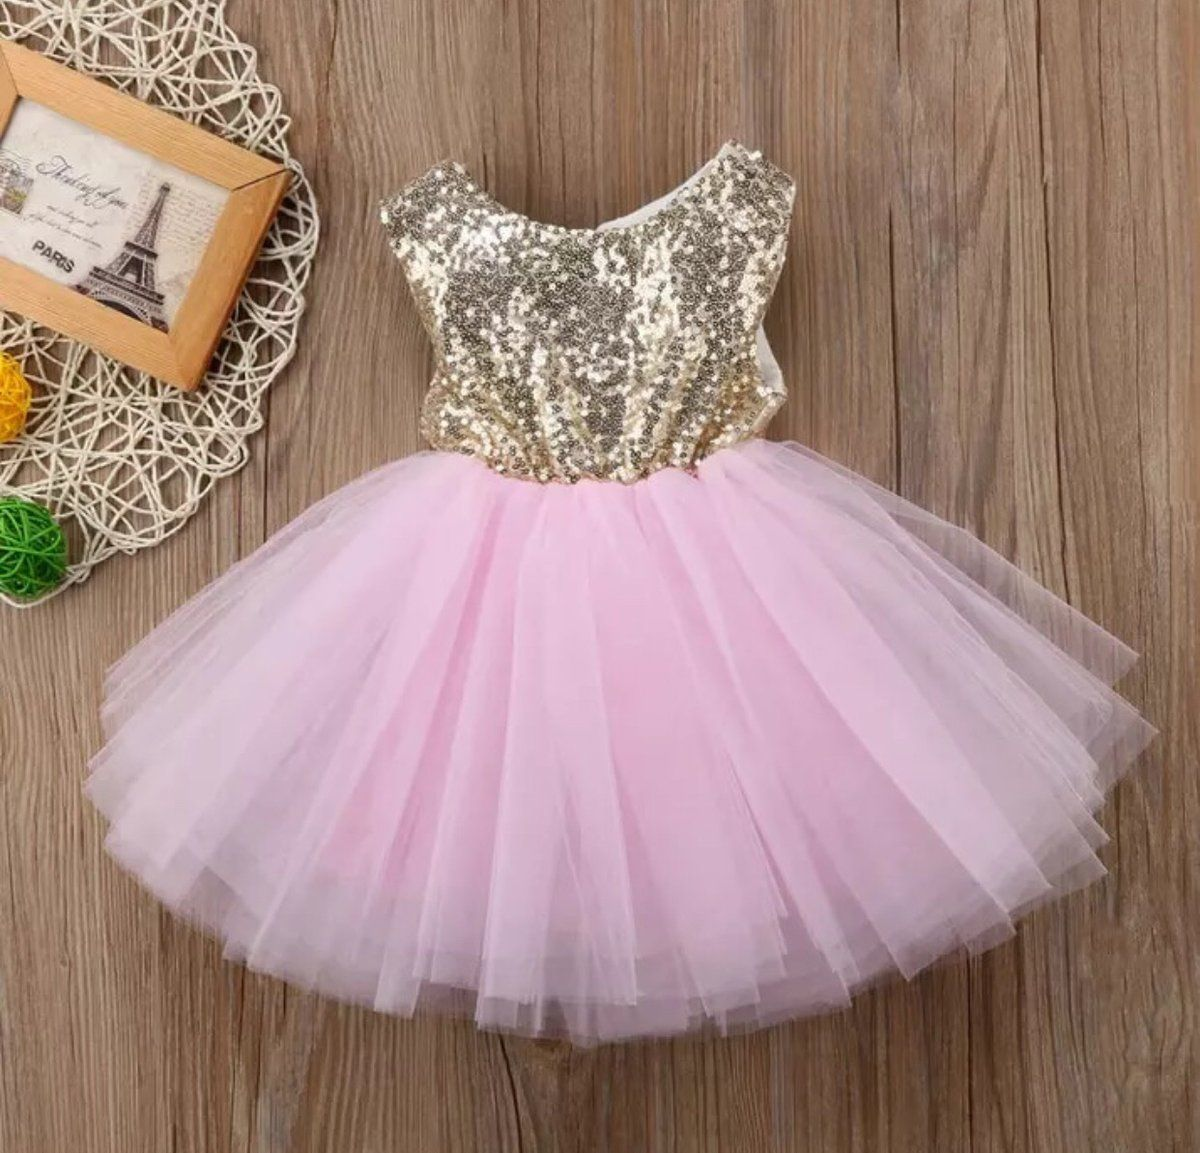 UK Baby Girl Princess Dress Baby Party Wedding Bridesmaid Tutu Bow Dresses Skirt